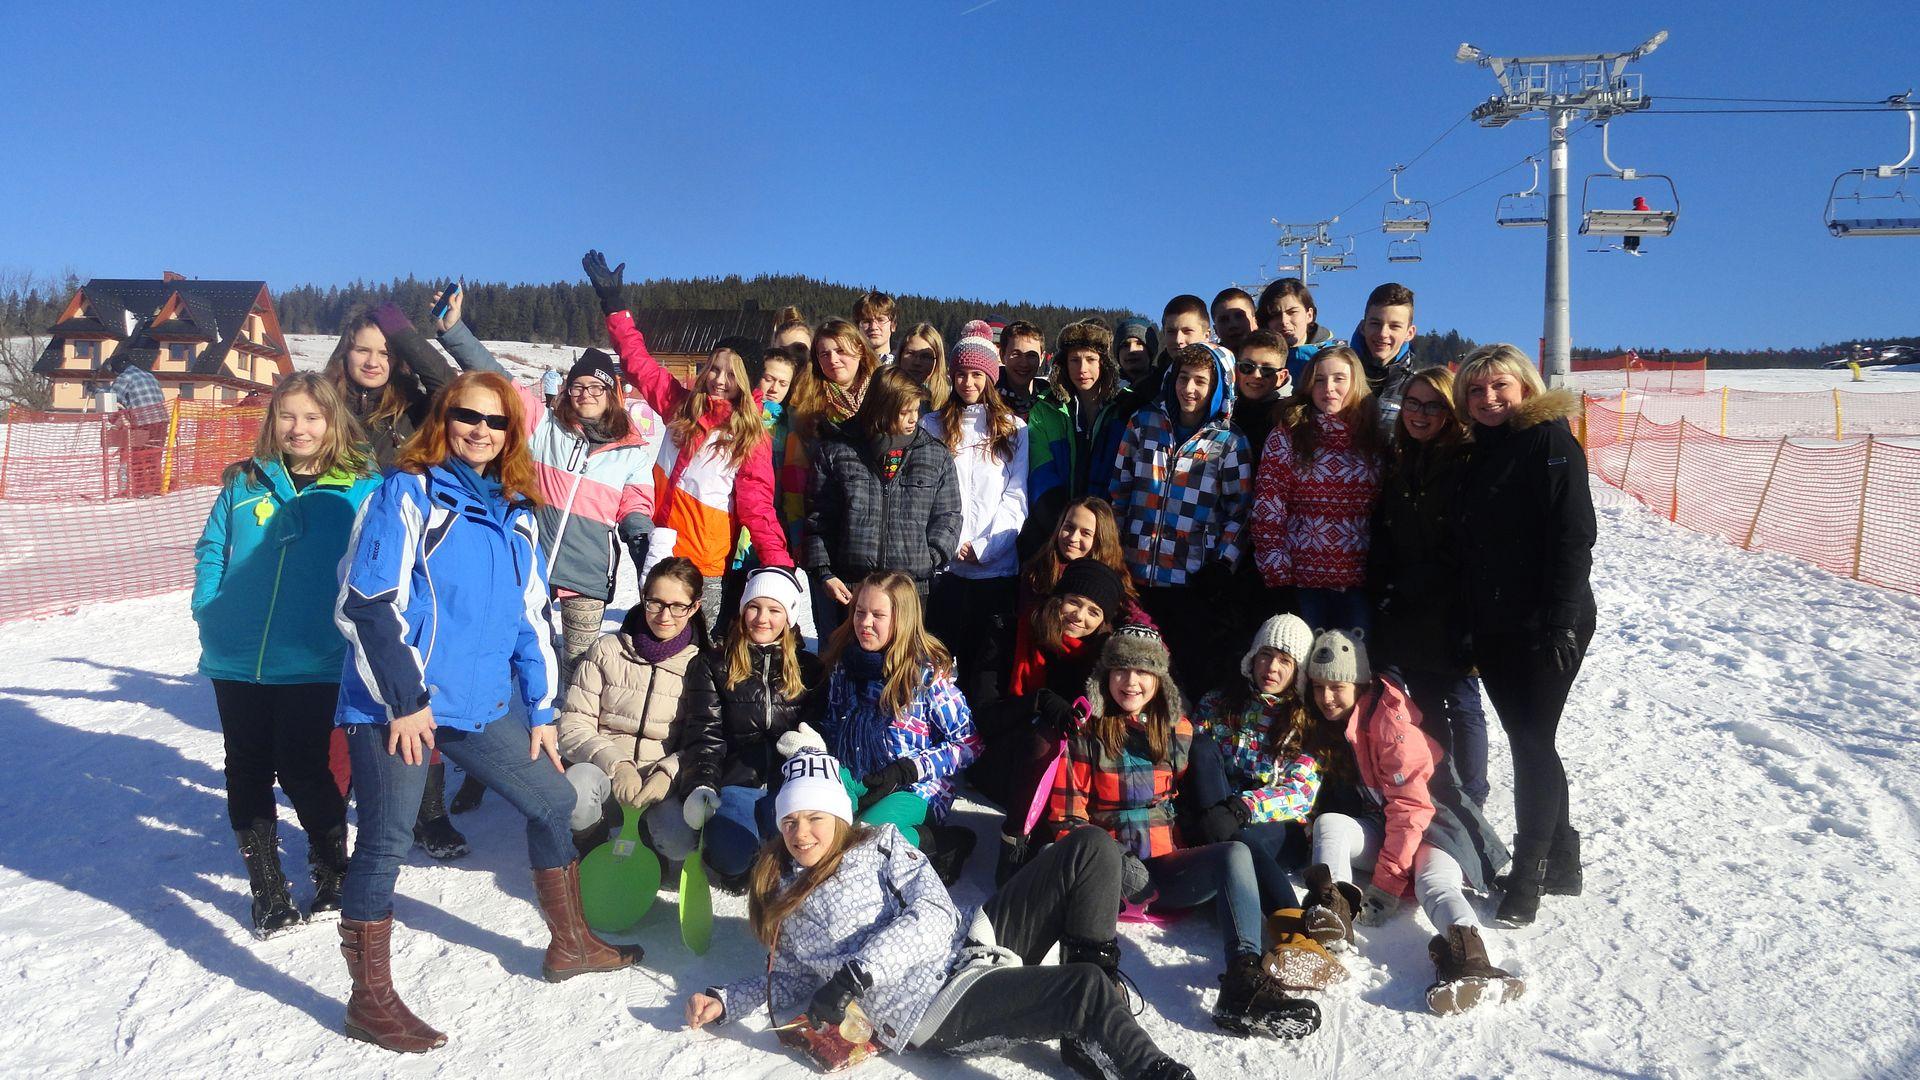 CarTourist_narty-snowboard_2014-foto-9